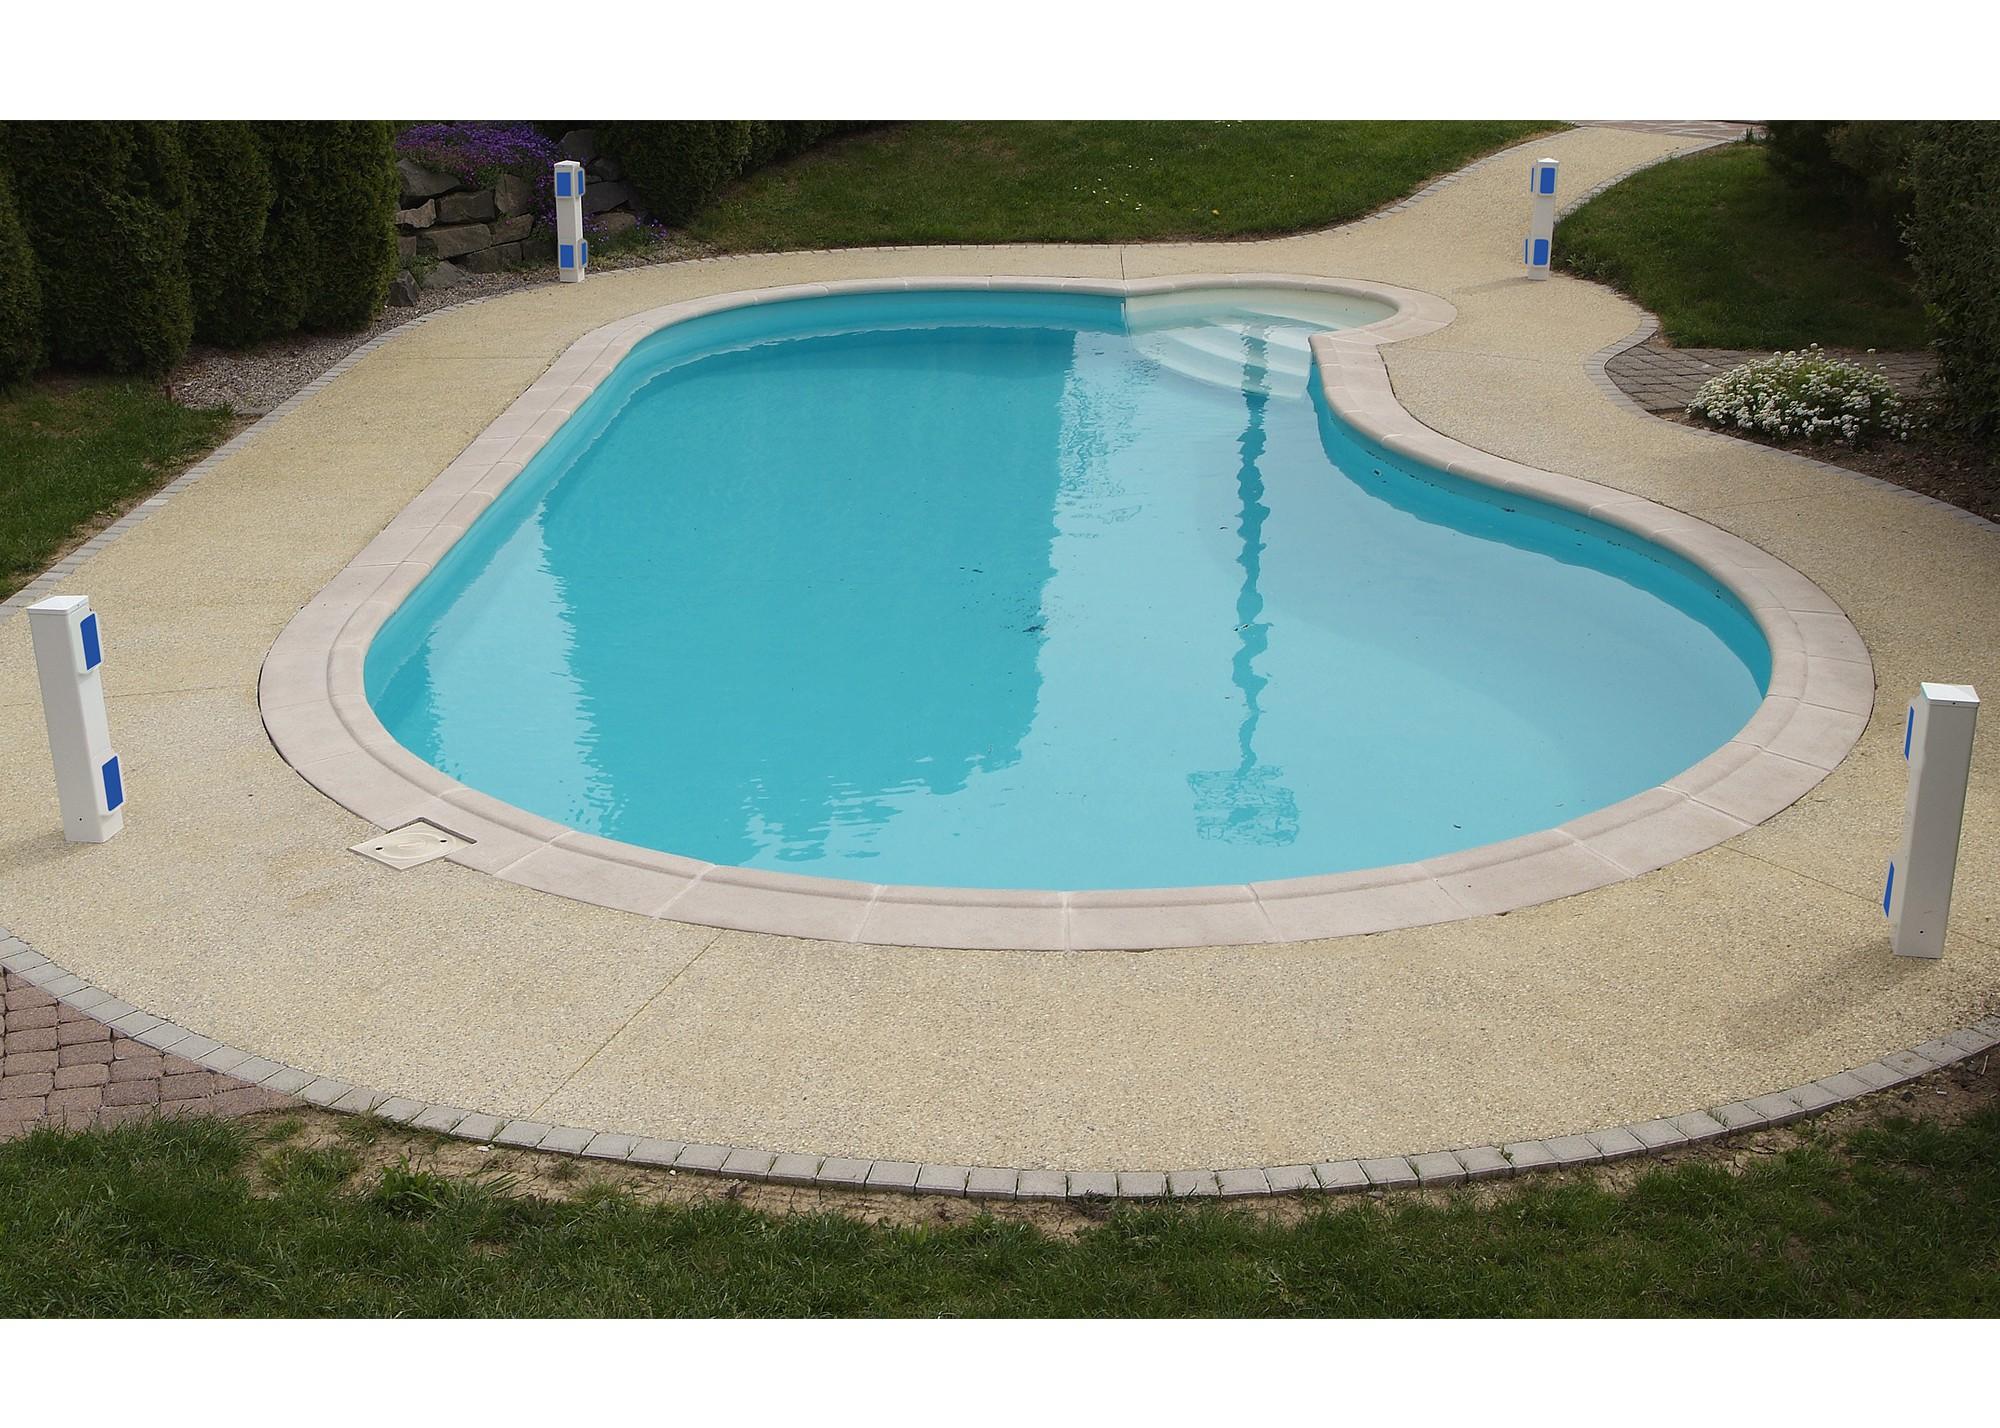 alarme piscine infrarouge avis